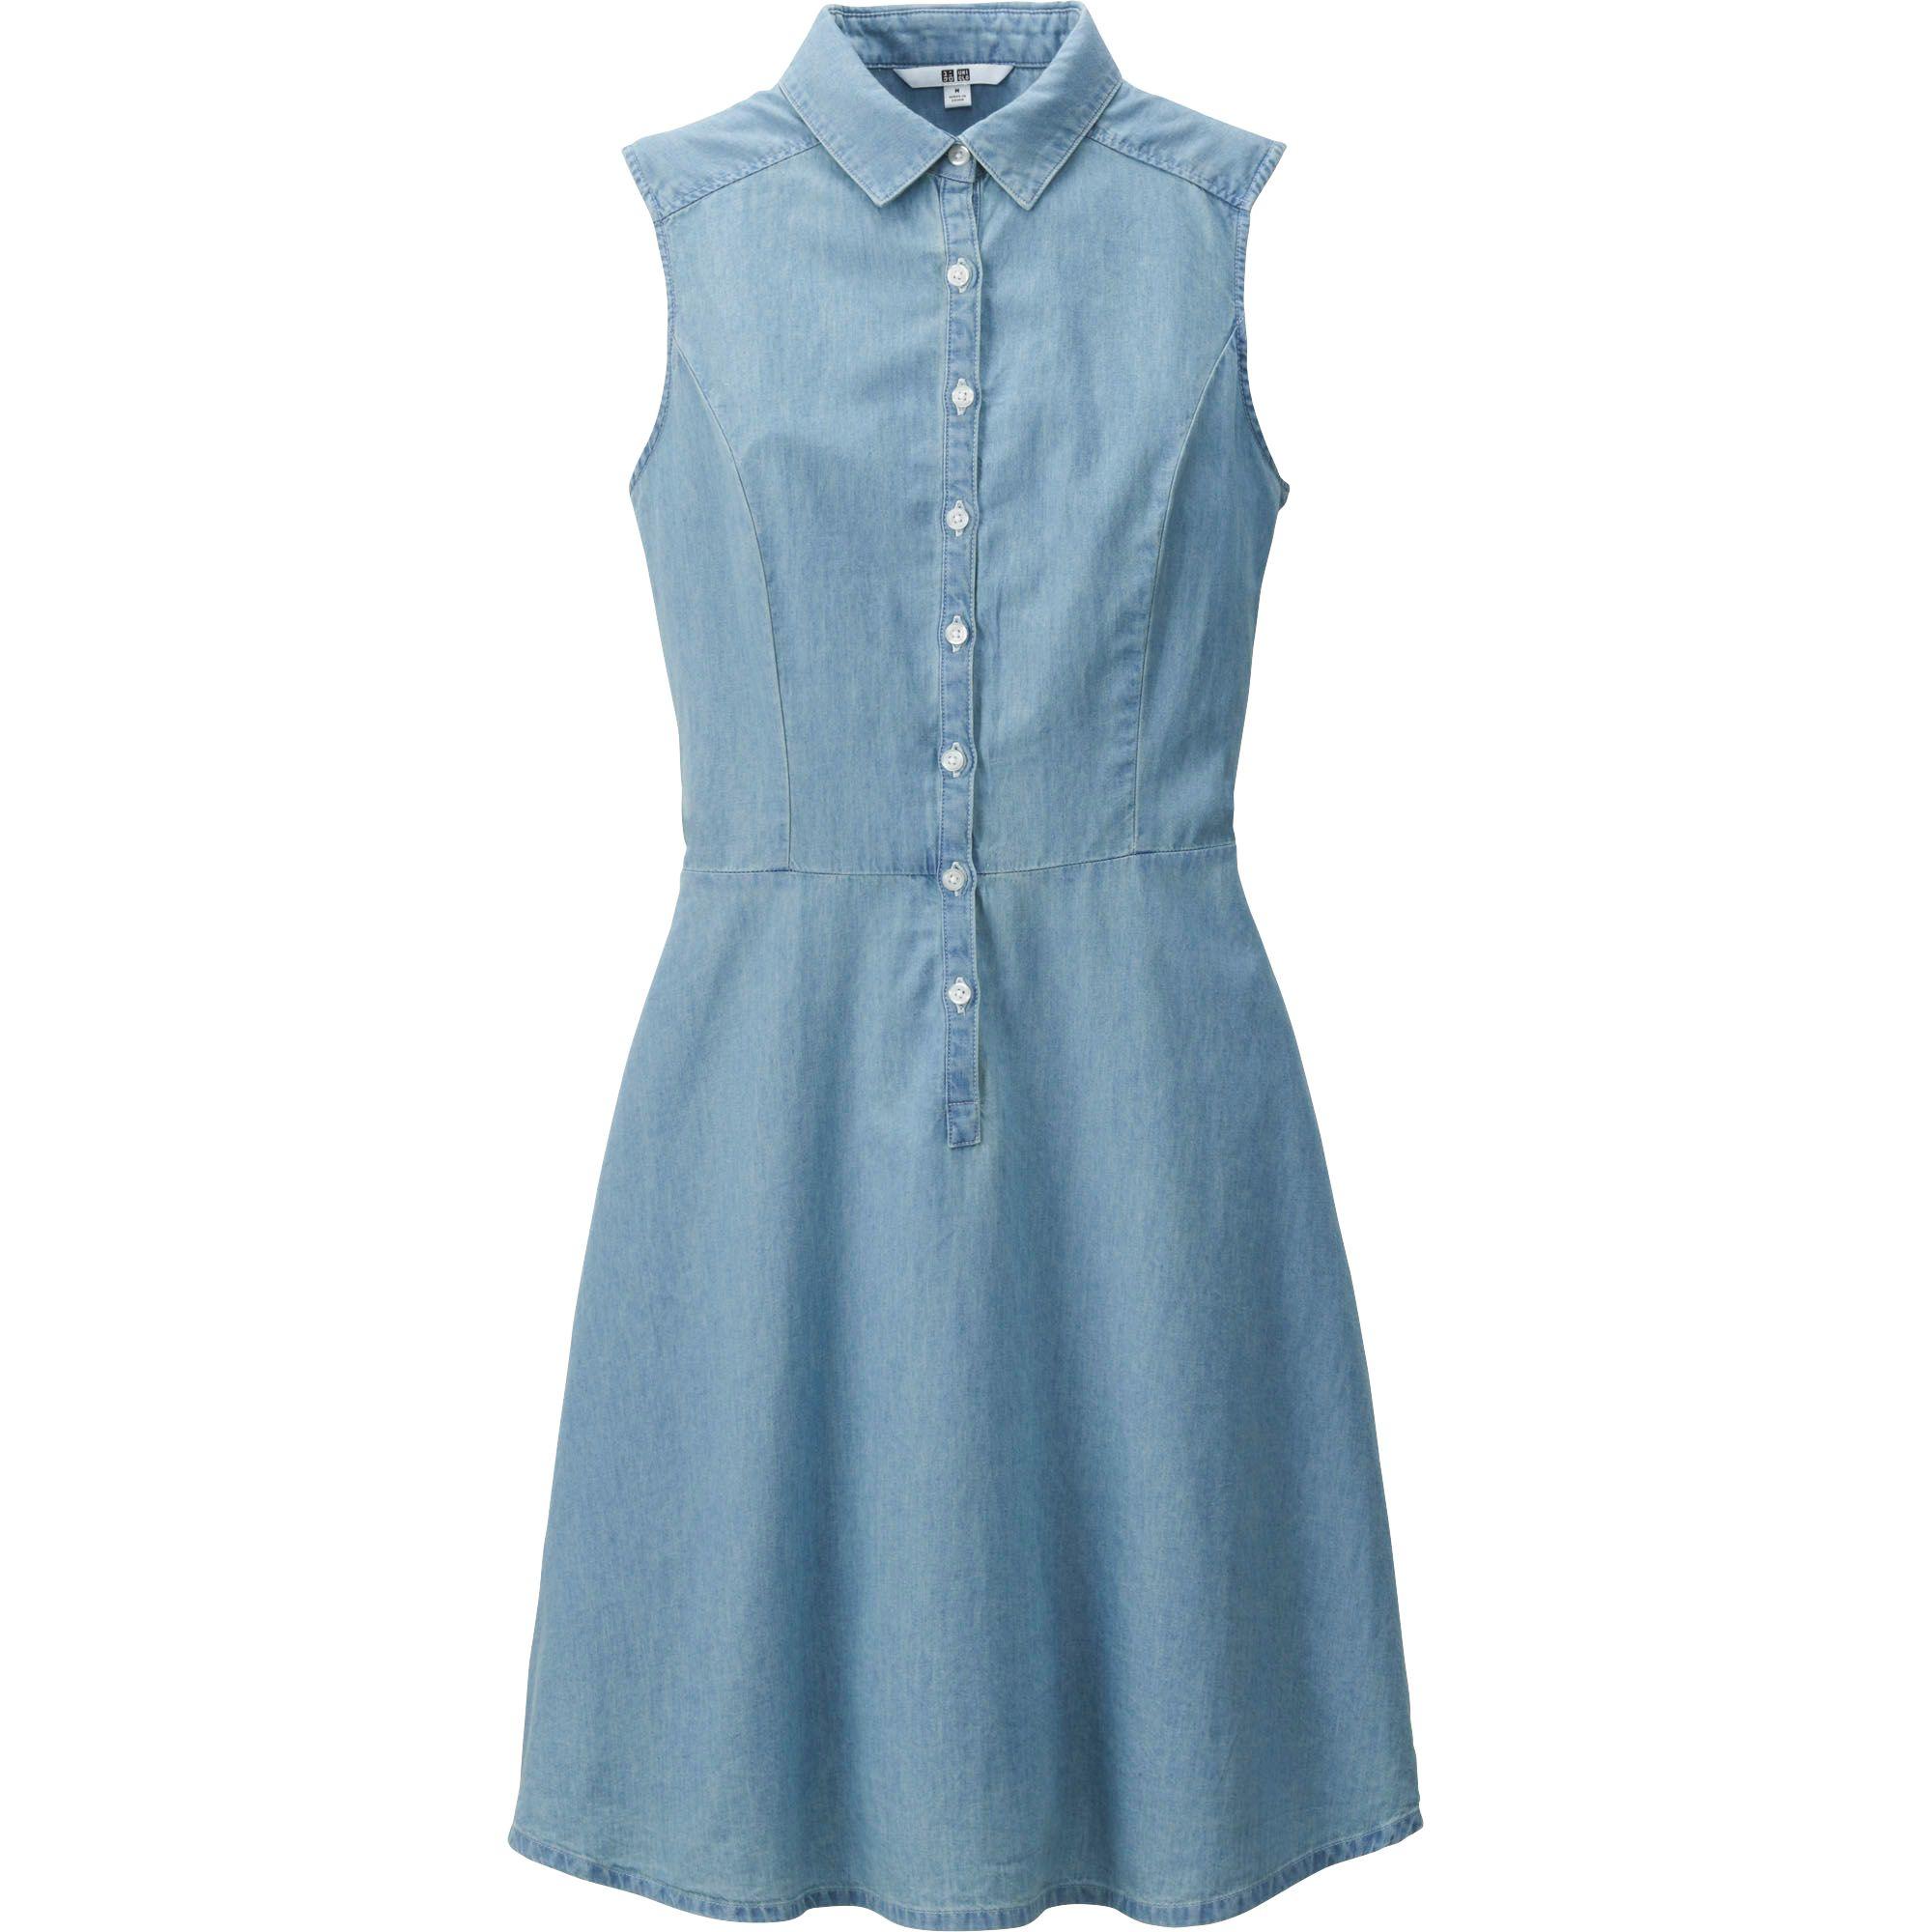 Luxury Shirt  Morris  Light Blue  Blouses Amp Shirts  Clothing  Women